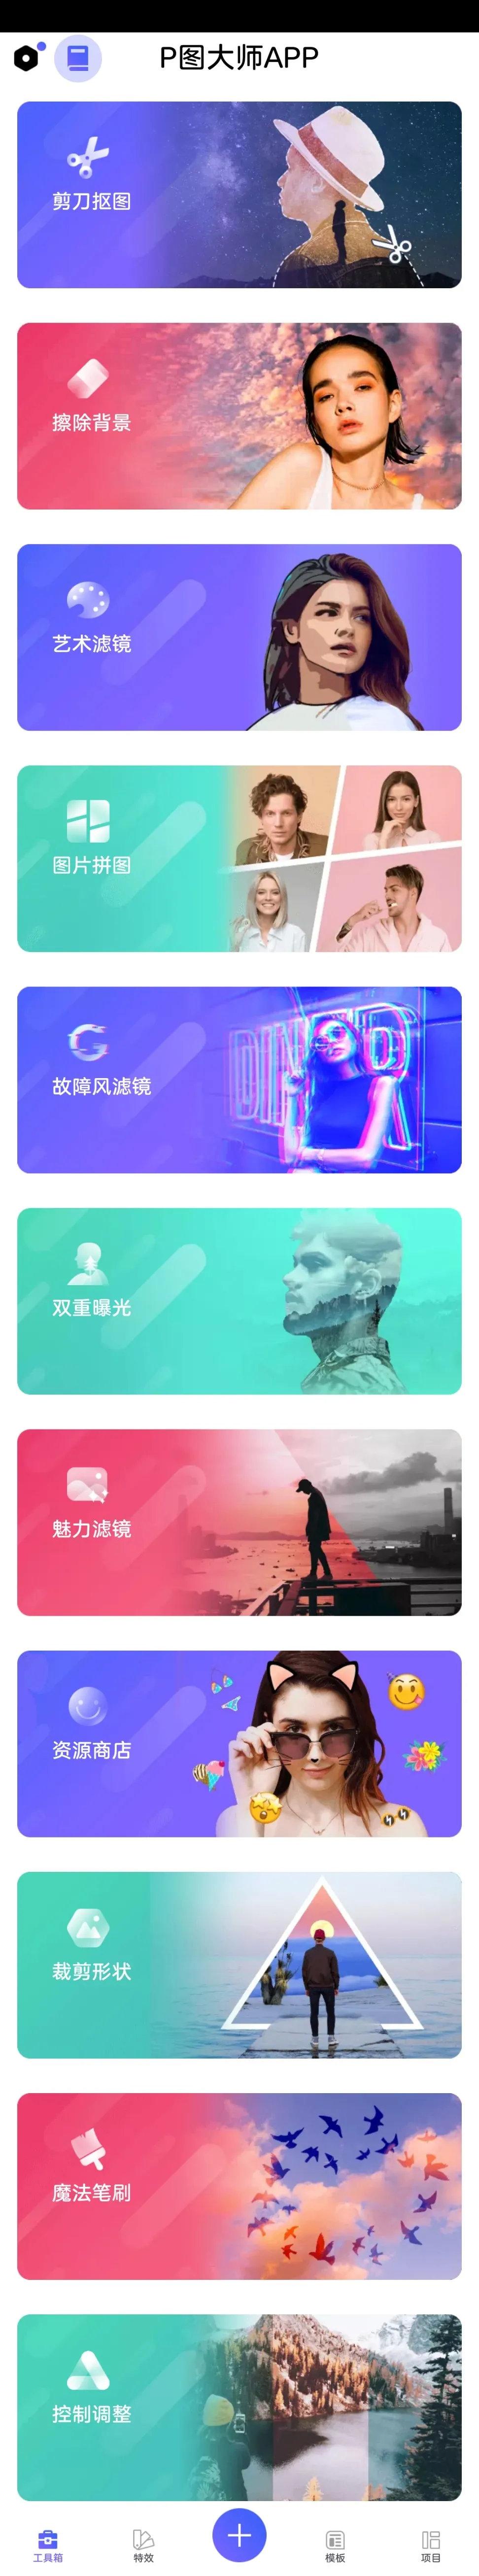 P图大师会员版,支持智能抠图和擦除背景,还有海量海报模版! 其他软件 第1张